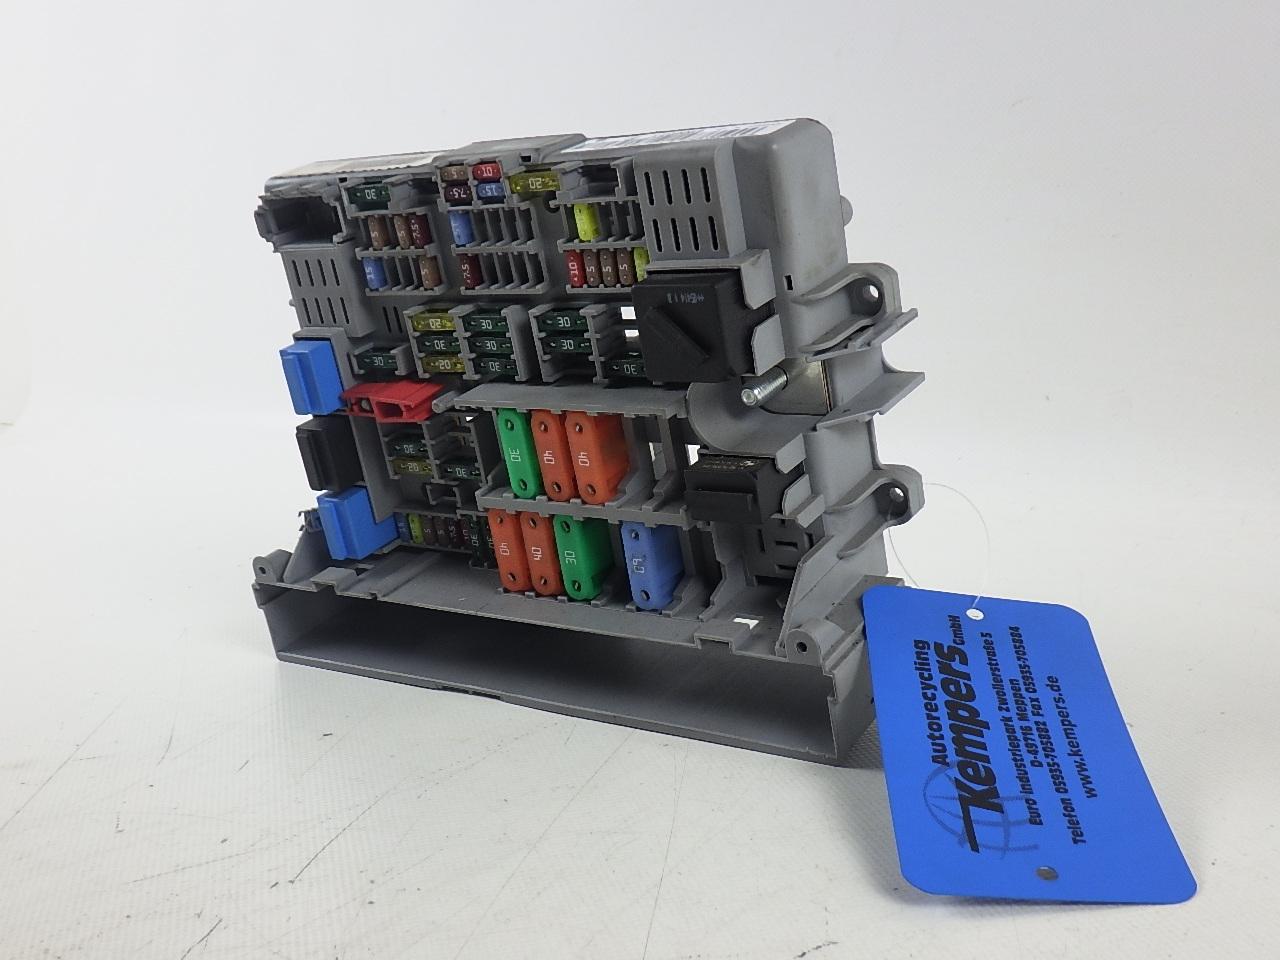 Bmw Fuse Box S 3 - List of Wiring Diagrams Honda Accord Euro Fuse Box on